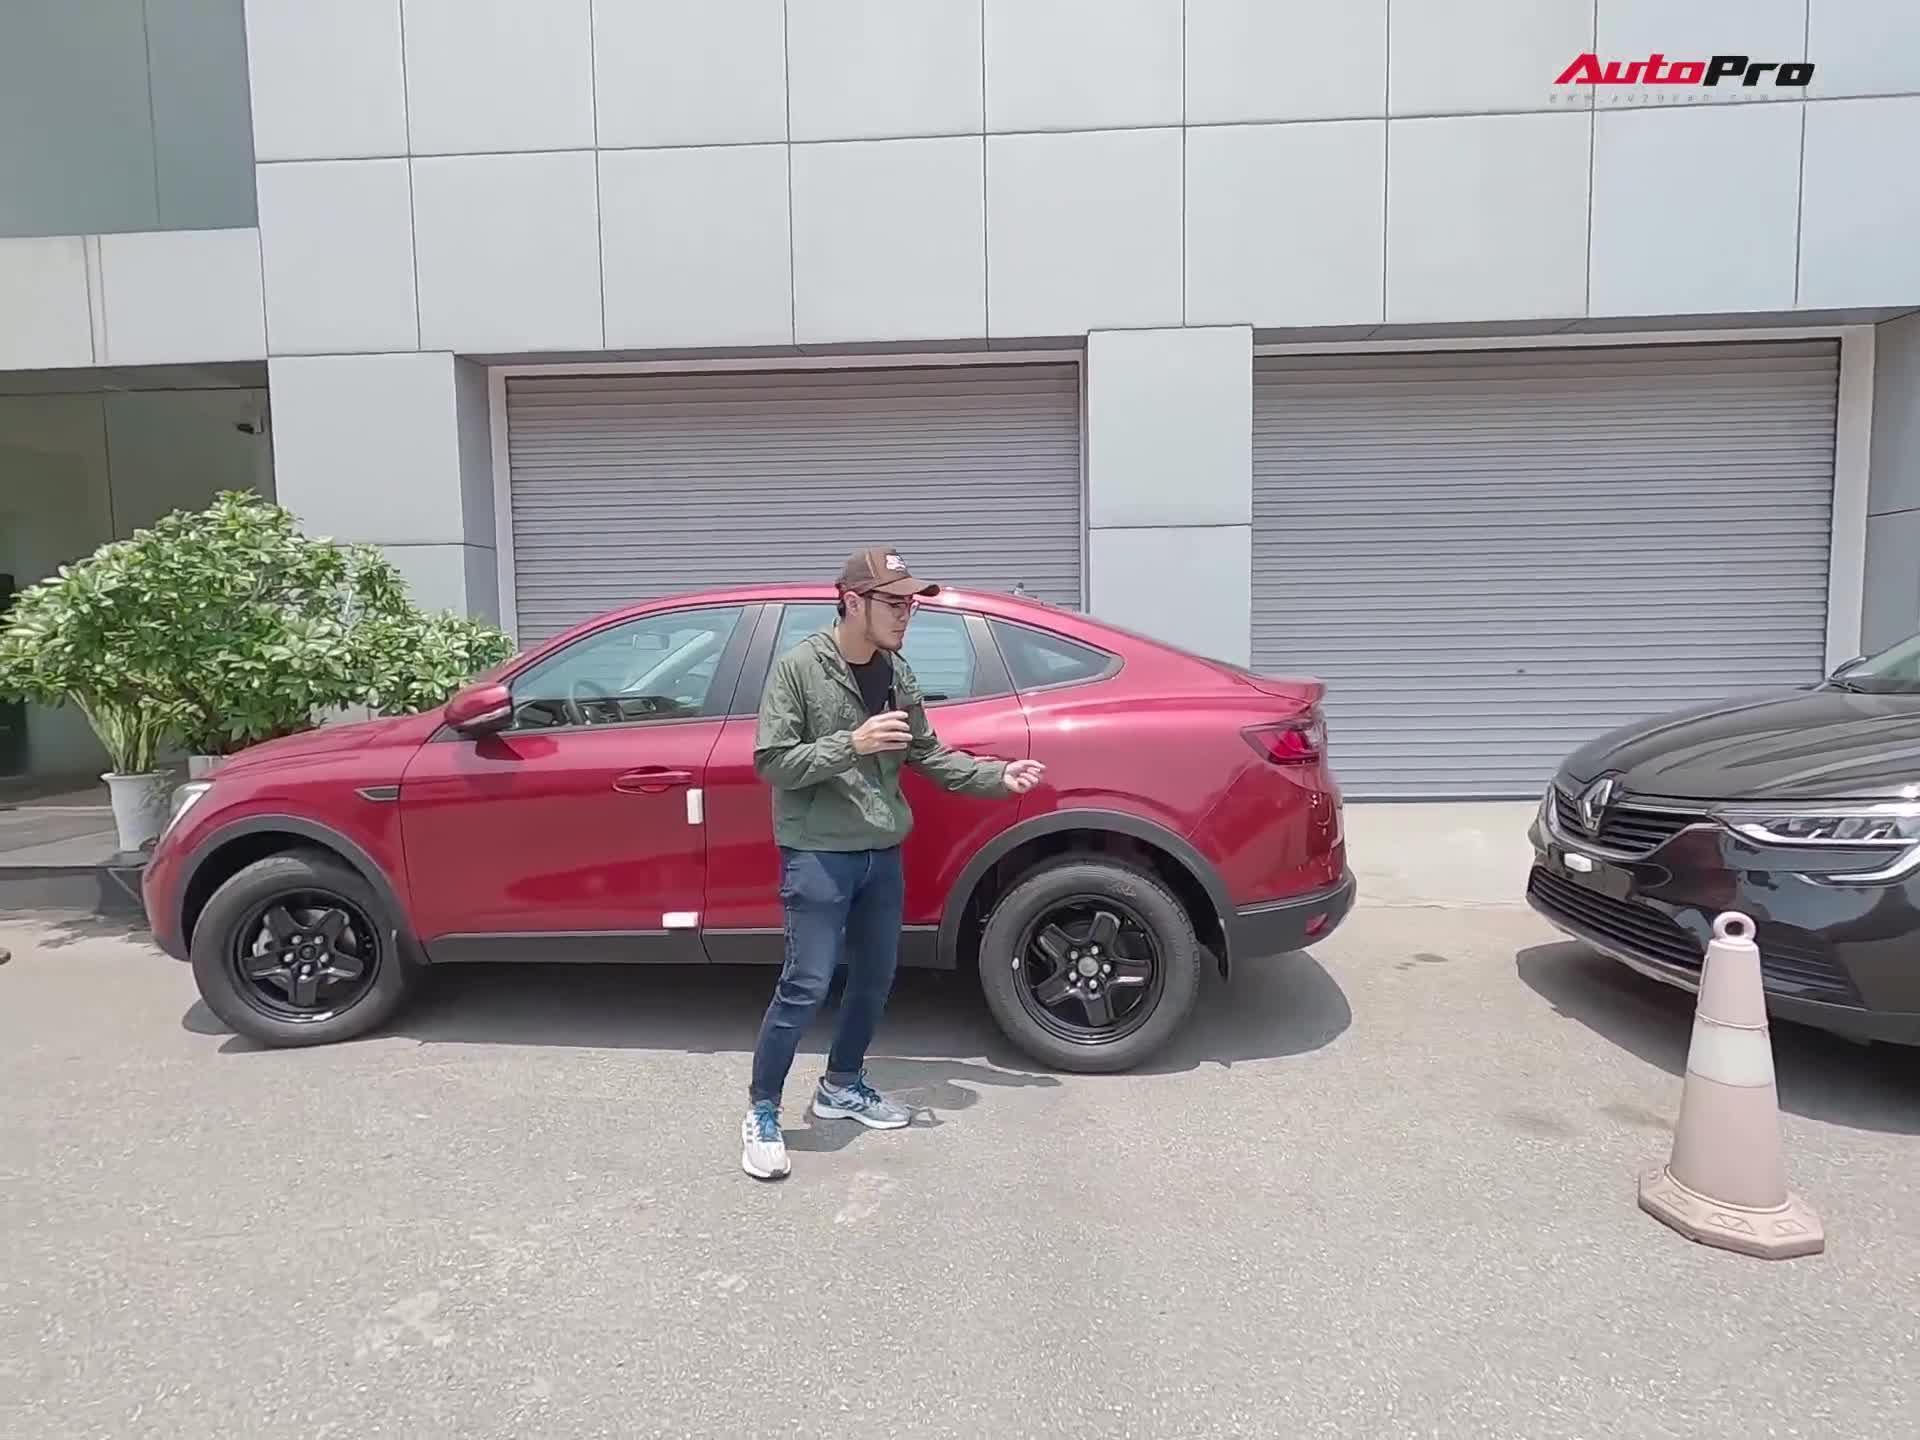 Đánh giá nhanh Renault Arkana 2020